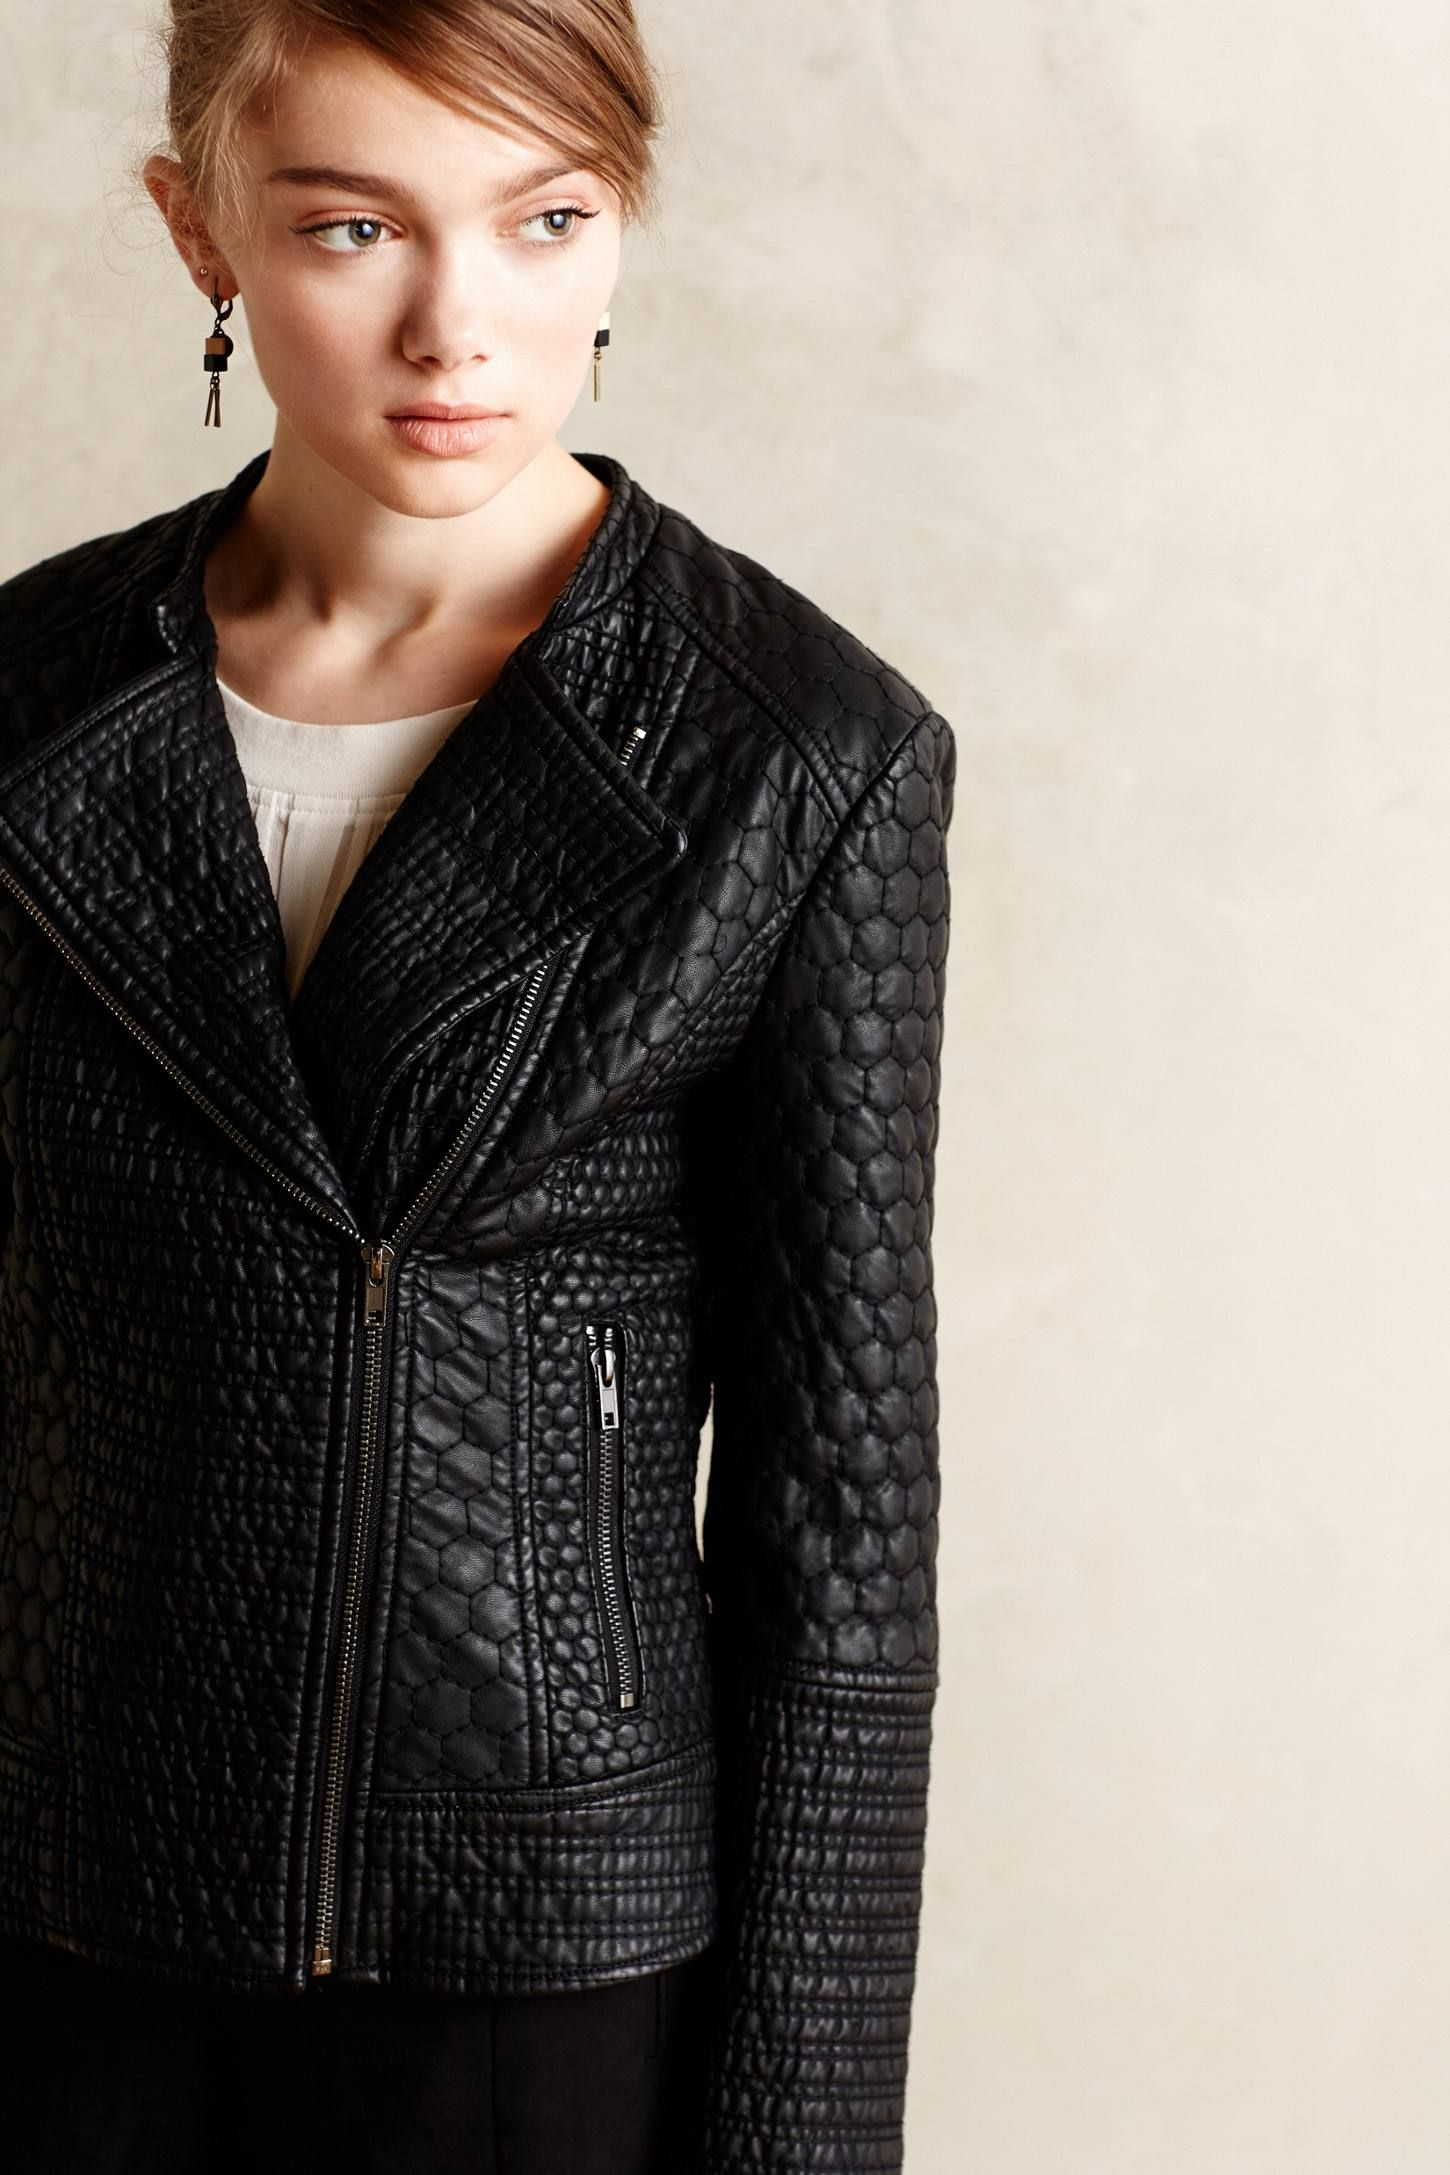 Honeycomb Quilted Vegan Leather Jacket Vegan Leather Jacket Leather Jacket Vegan Leather